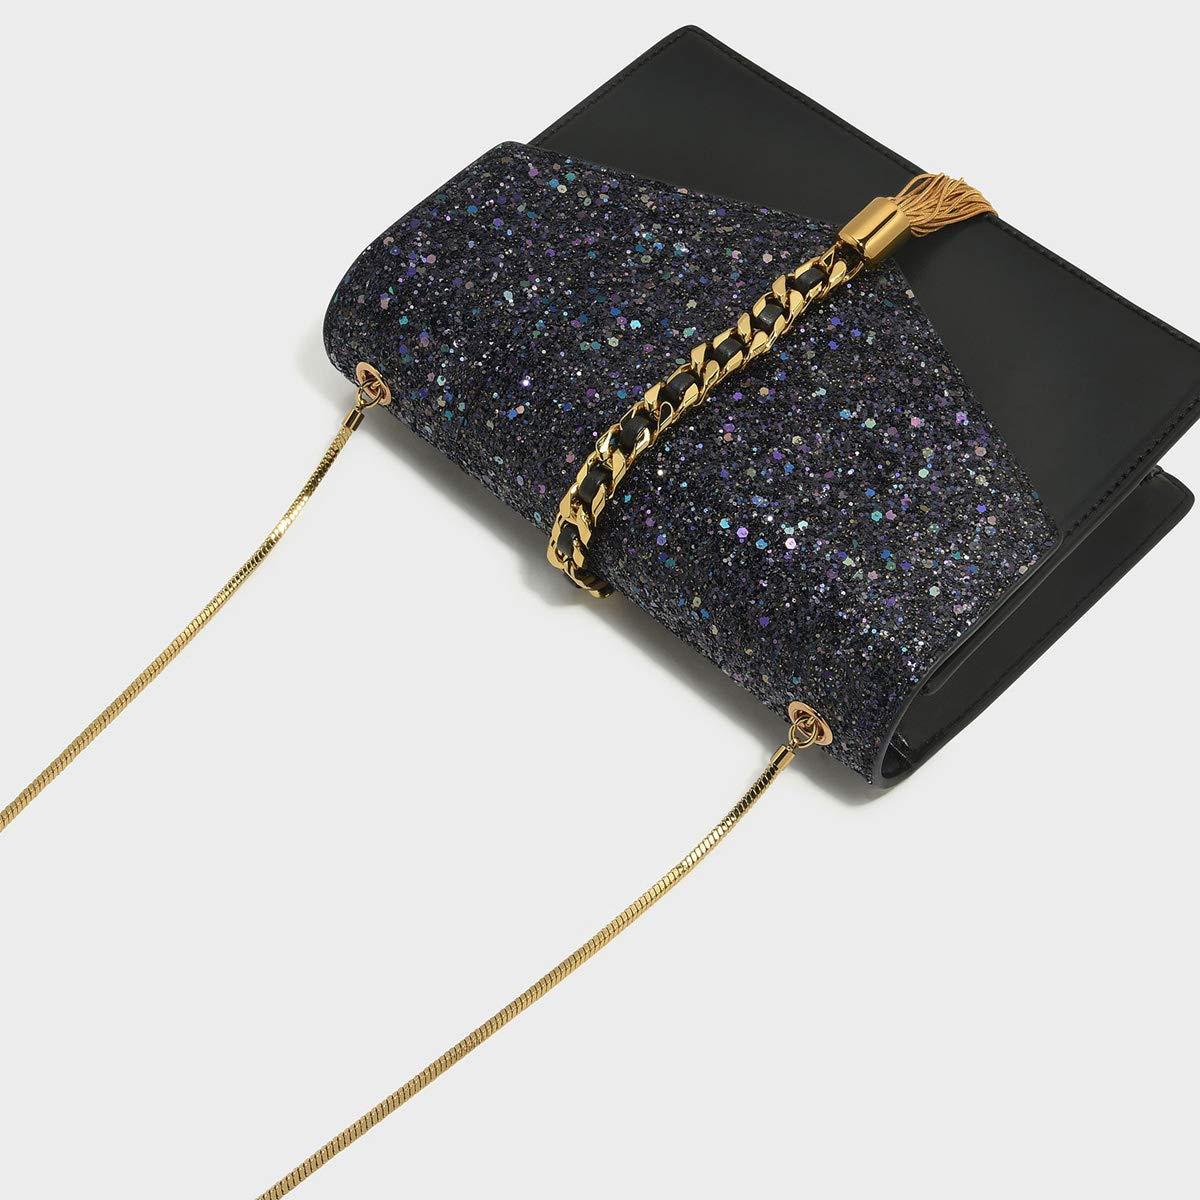 27a7fea5c8a0 Charles & Keith PU Tassel Detail Envelope Bag Small Chain Strap Shoulder  Handbag (Glitter Black): Handbags: Amazon.com